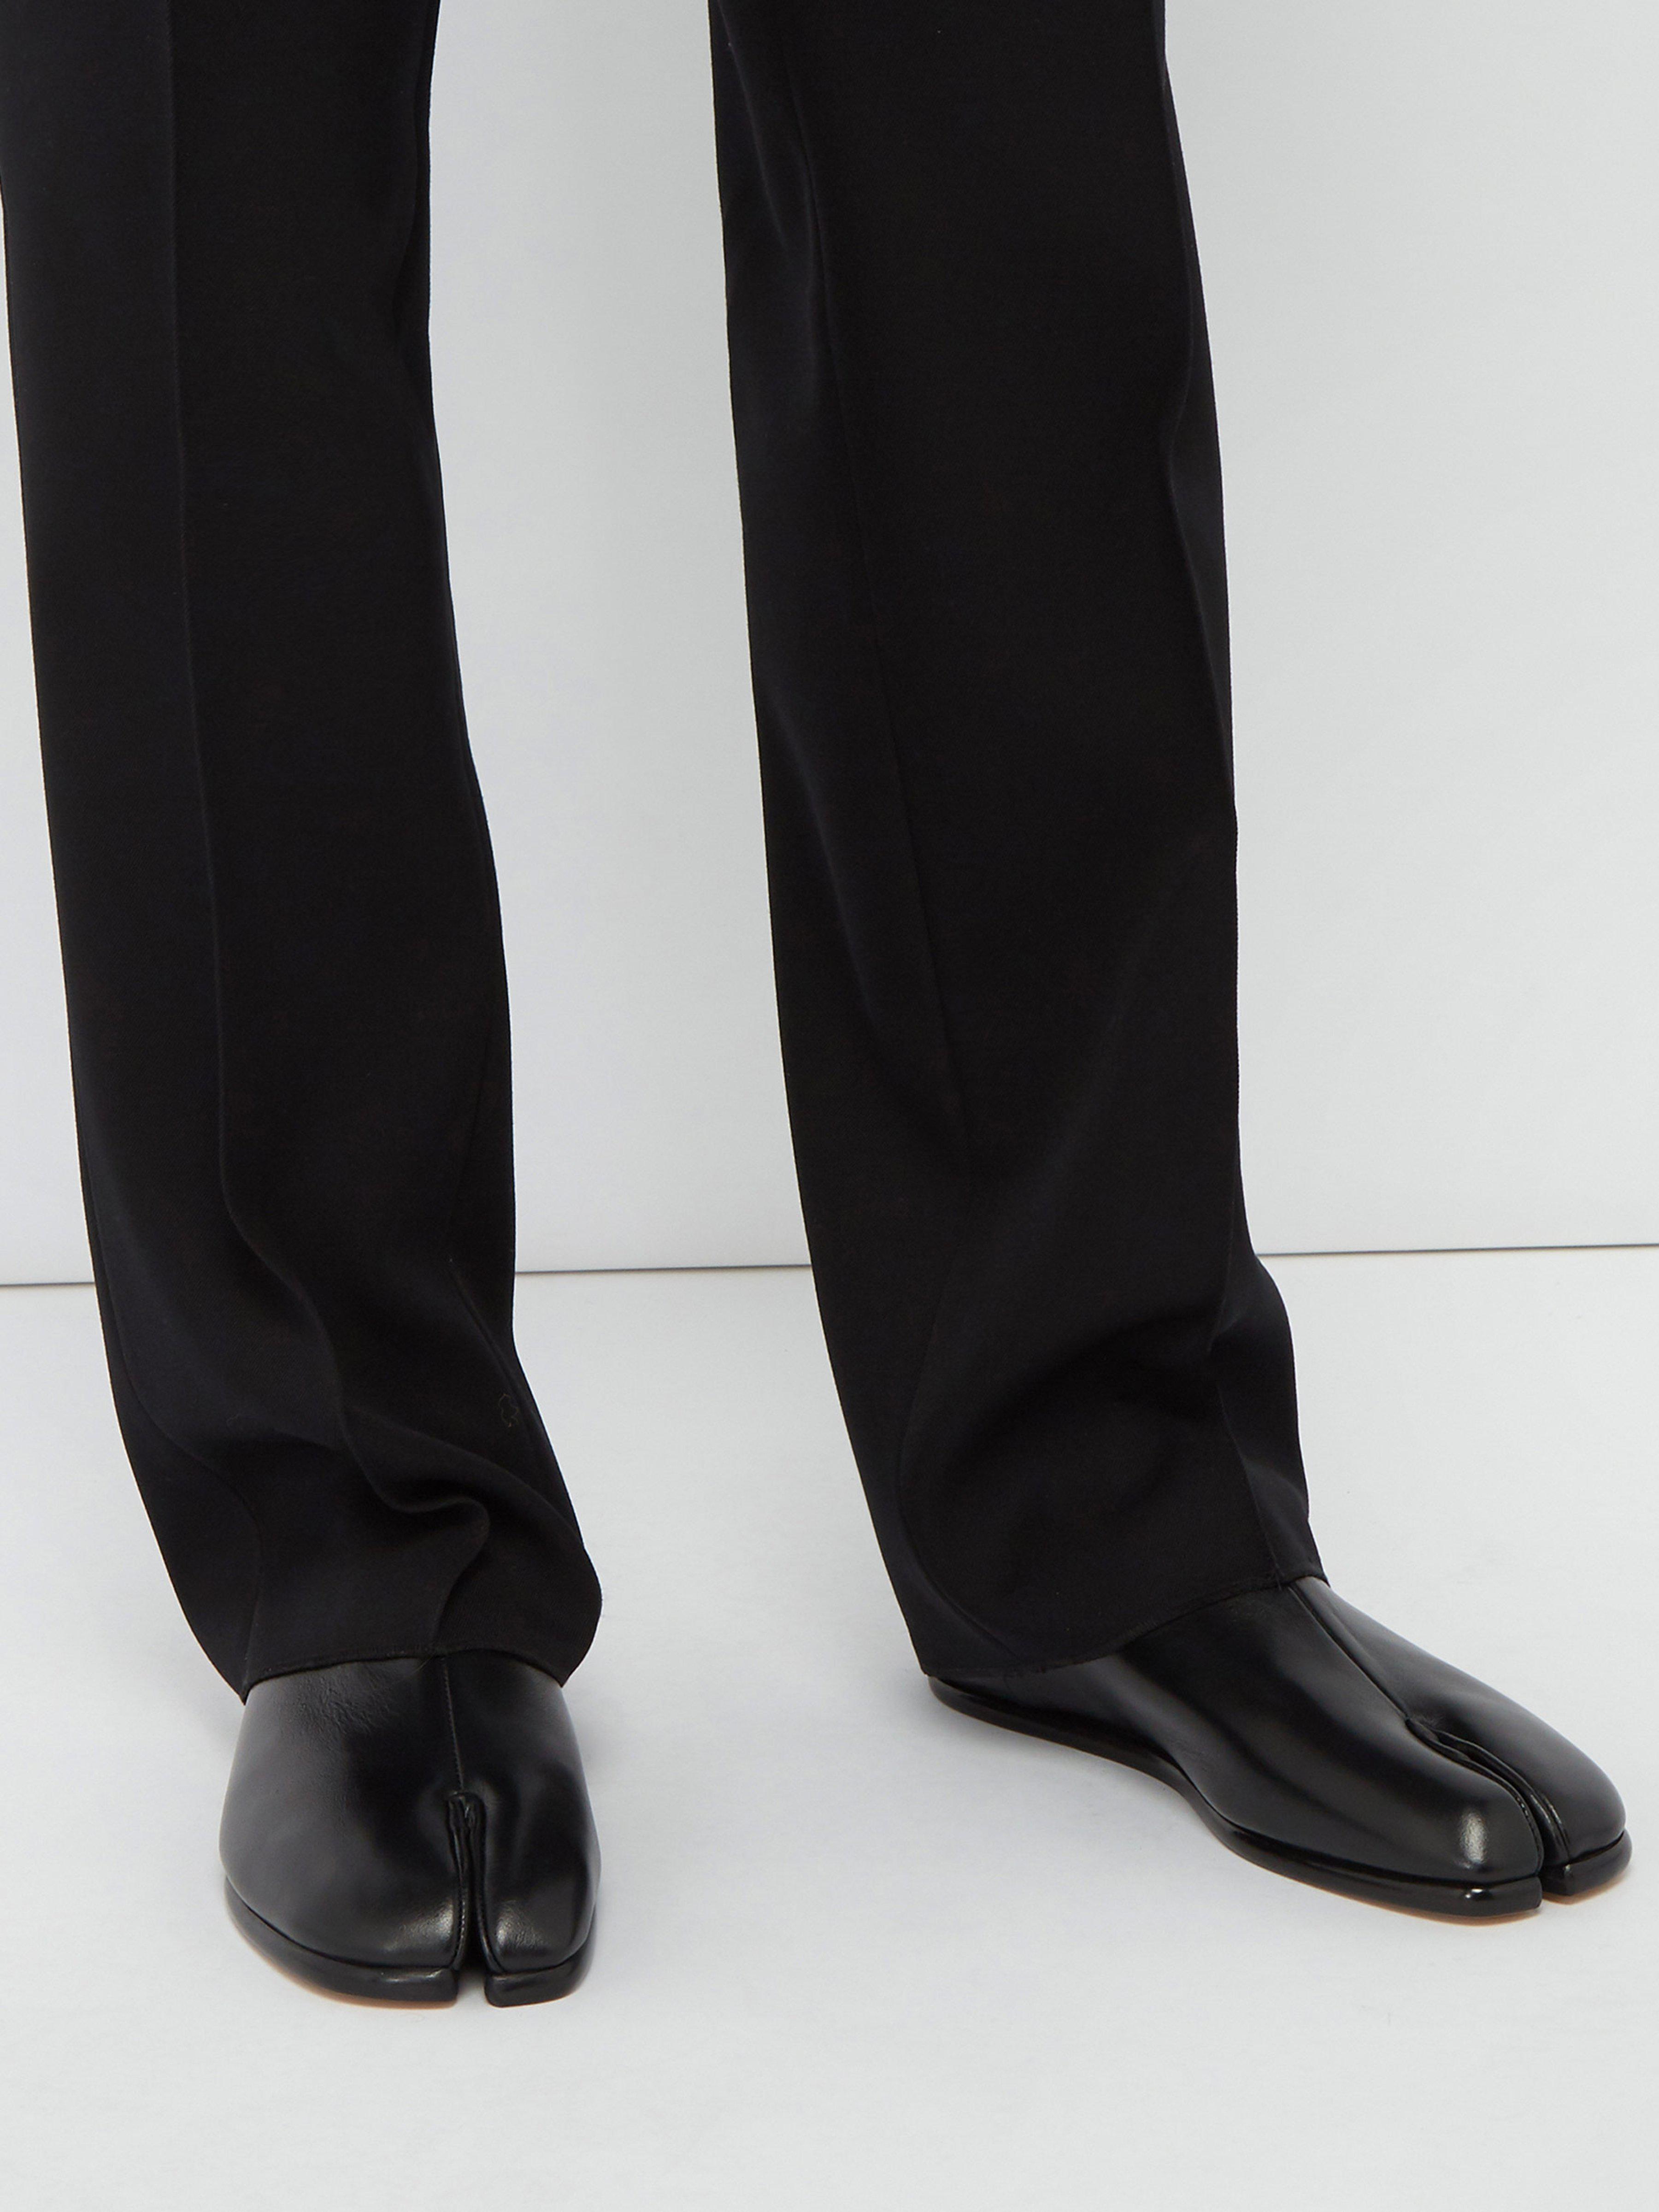 ff75b708c20 Maison Margiela Tabi Split Toe Leather Flats in Black for Men - Lyst